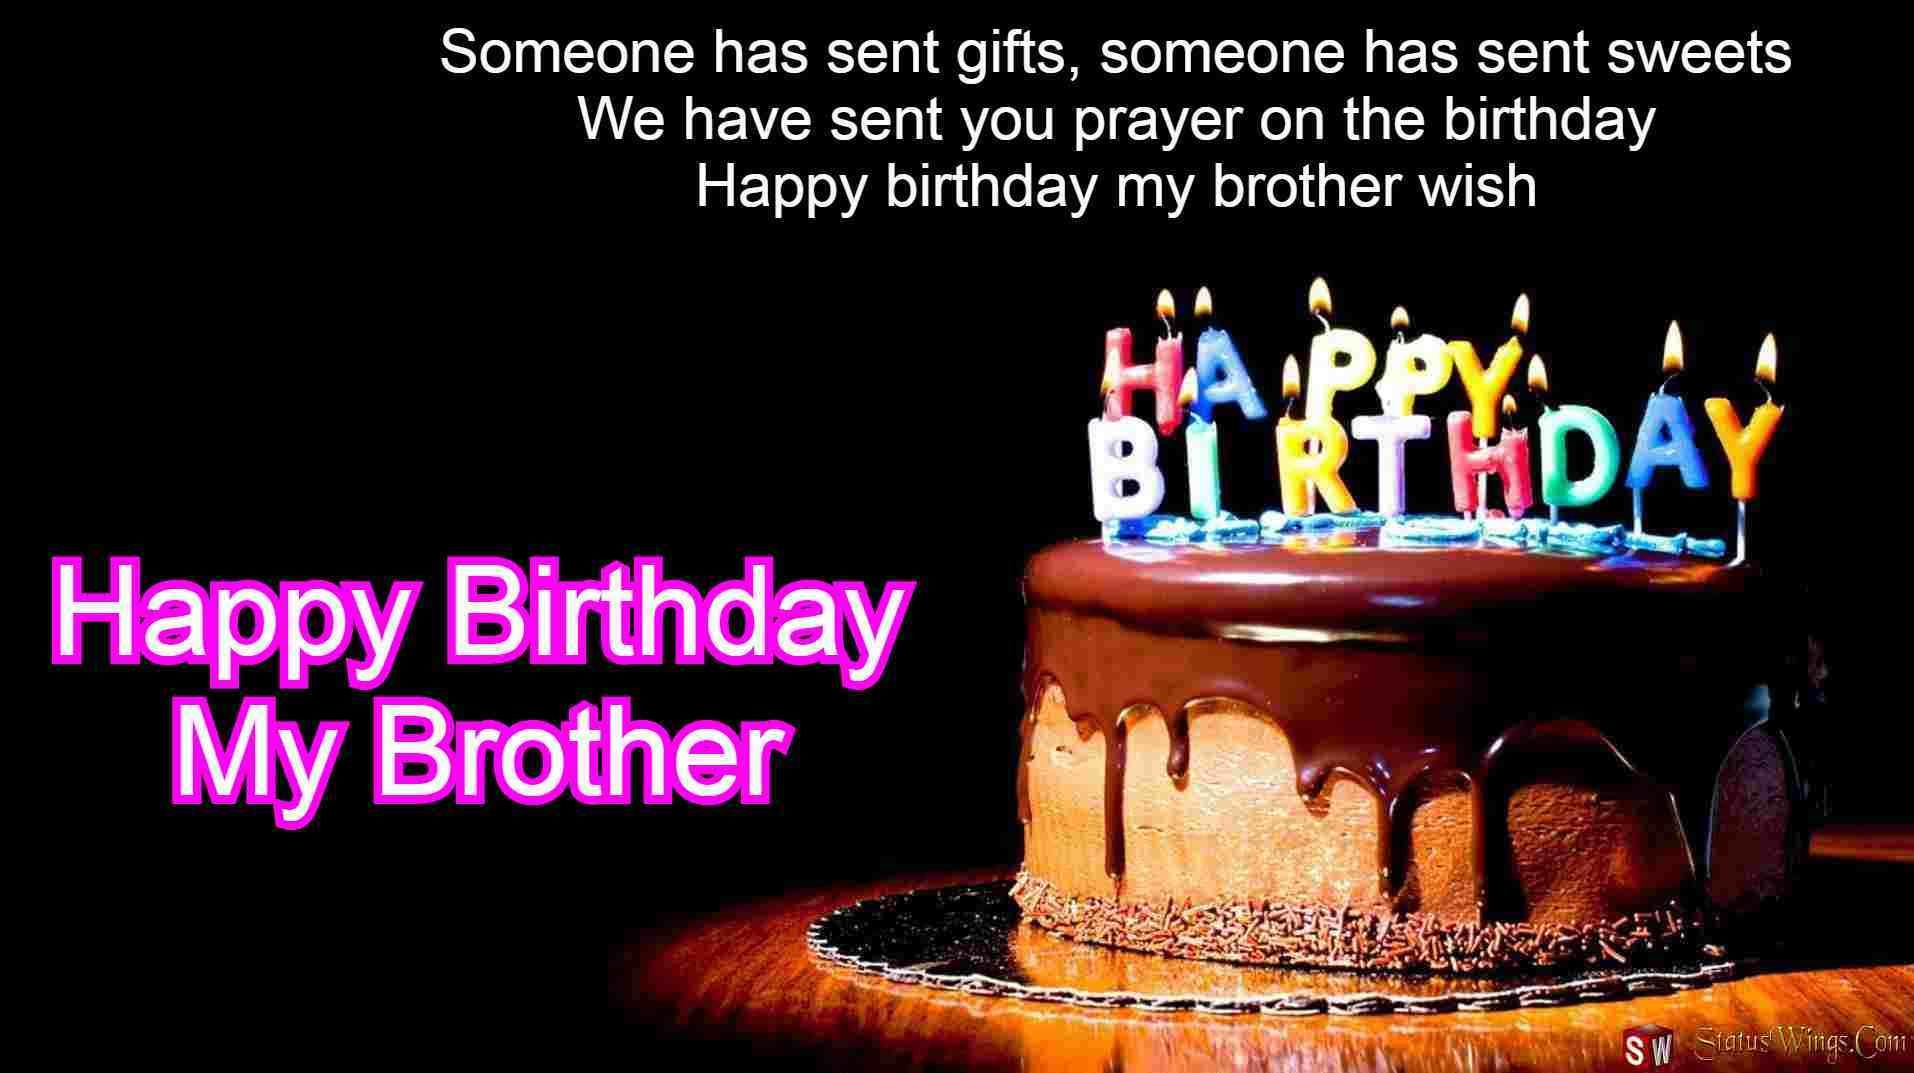 Big Brother Birthday Wish In English Little Brother Birthday Wish In English In 2021 Birthday Wishes For Brother Happy Birthday Brother Wishes Brother Birthday